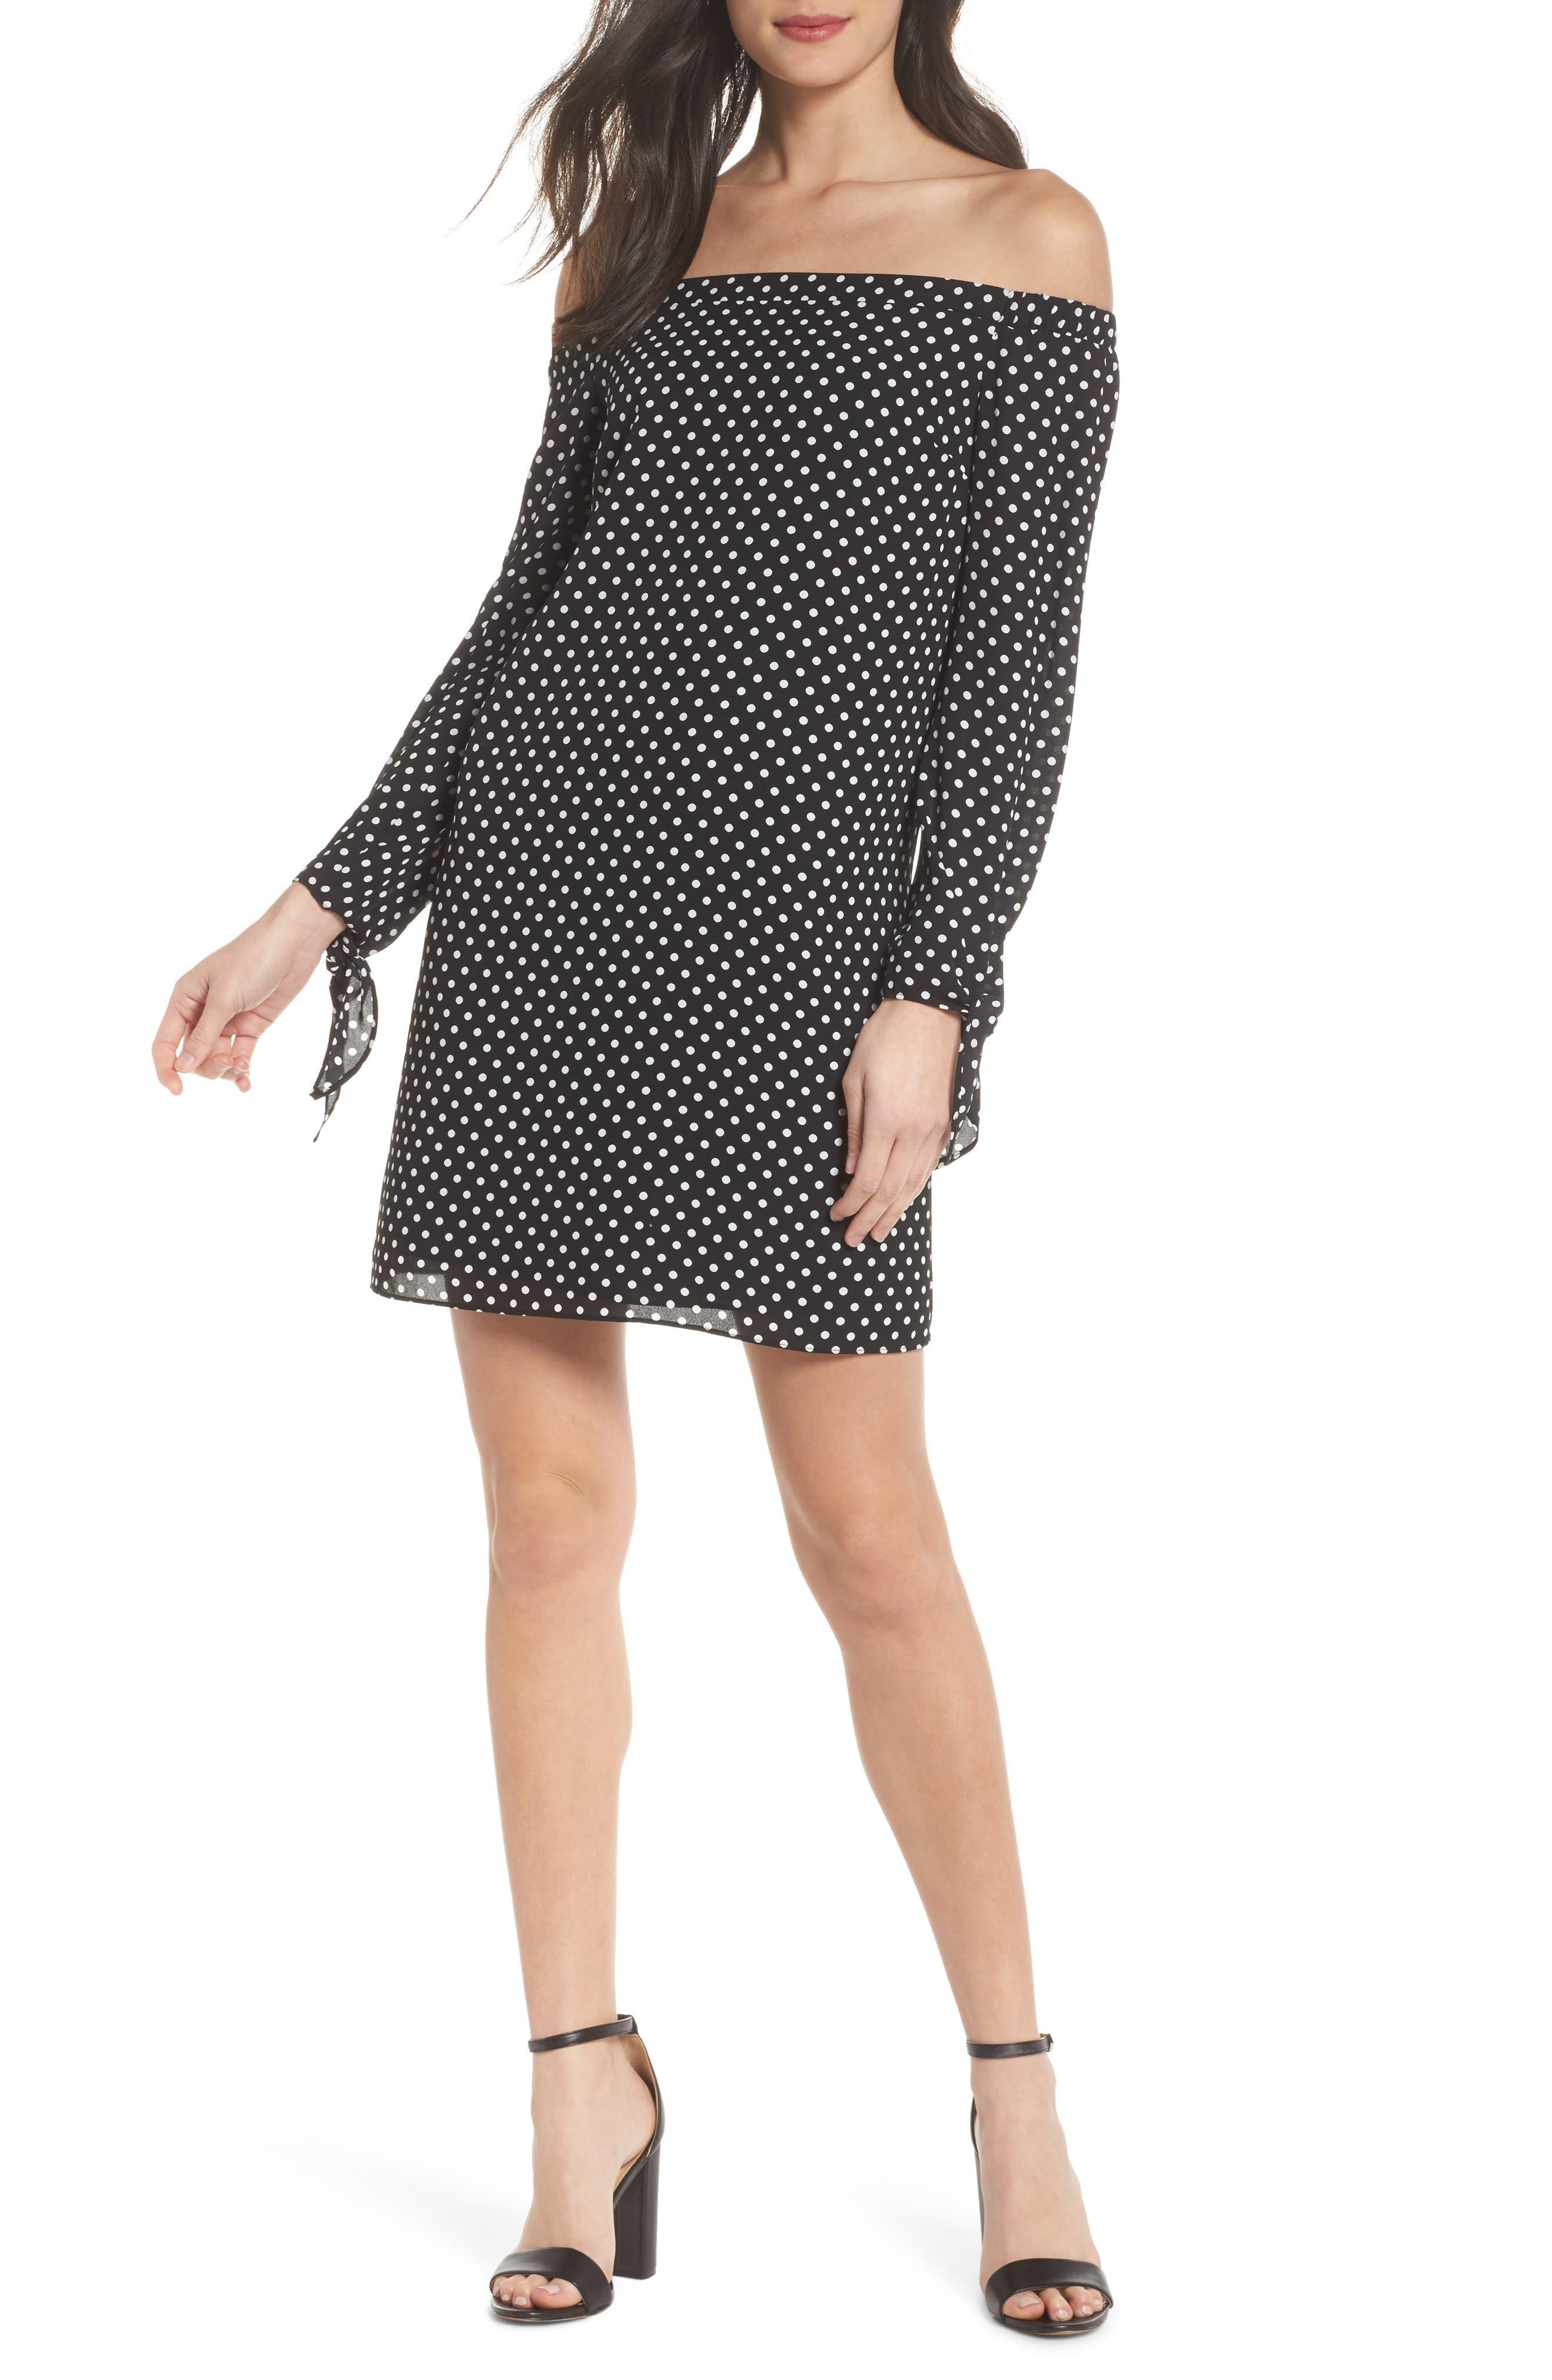 Polka Dot Off the Shoulder Minidress,                         Main,                         color, Black/ White